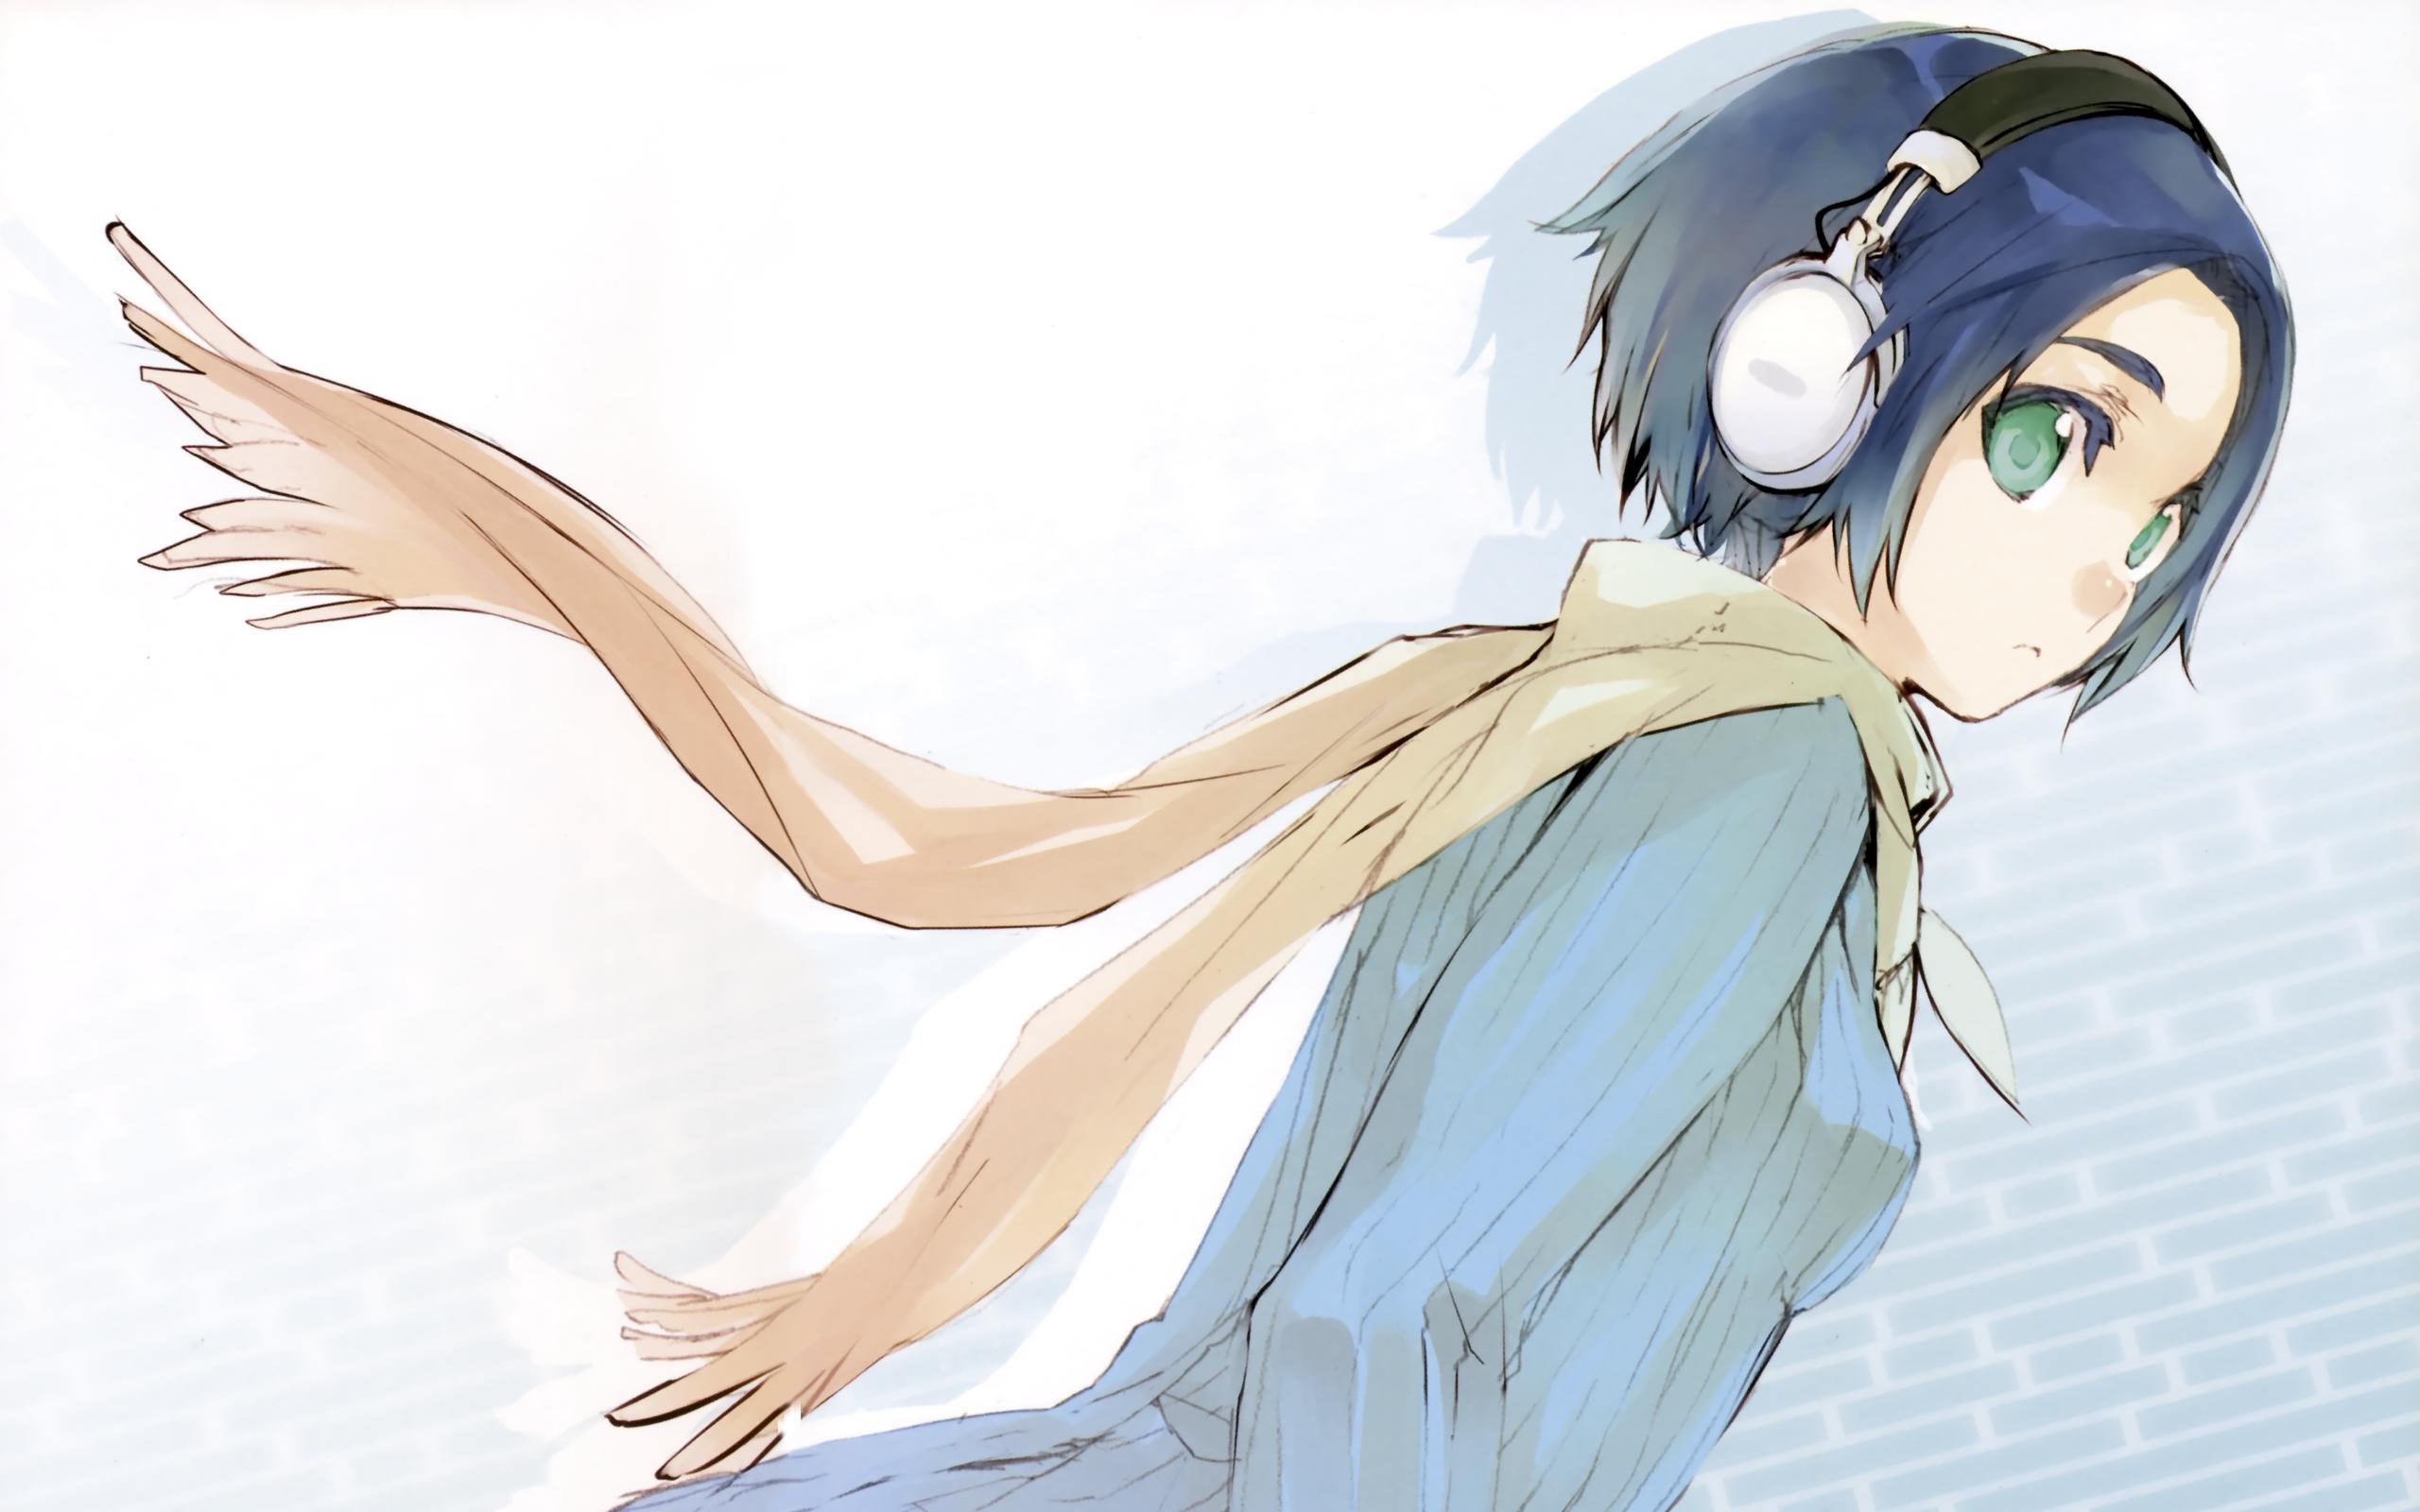 headphones blue hair headphones girl green eyes short hair